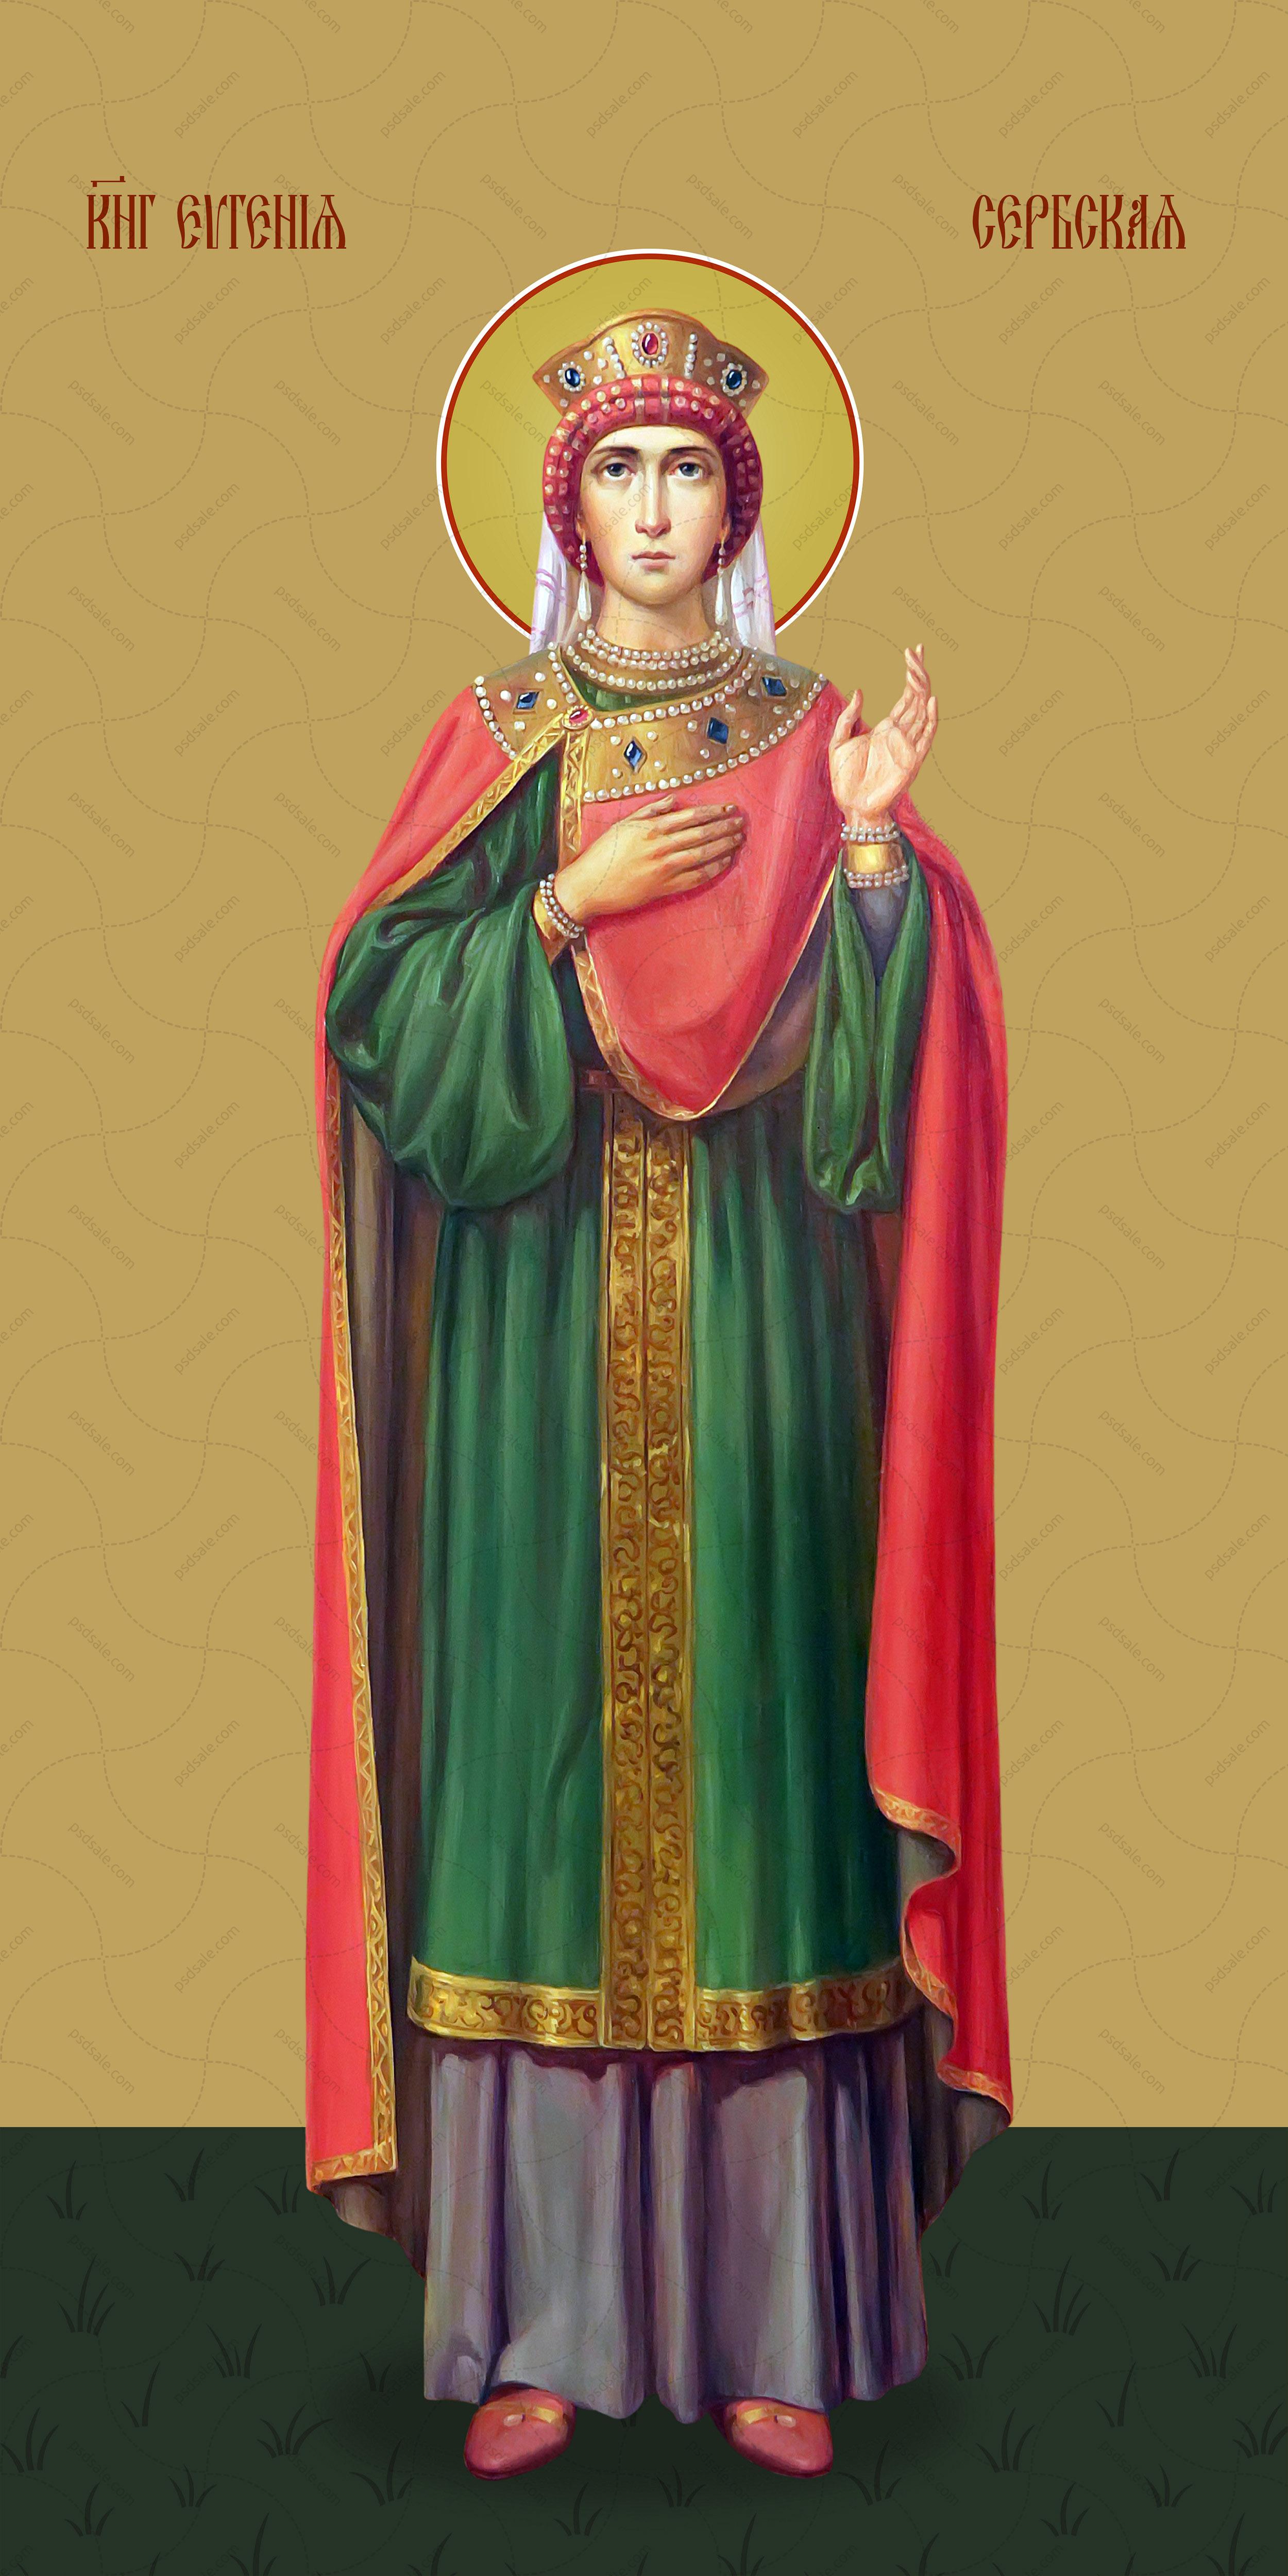 Мерная икона, Евгения Сербская, княжна